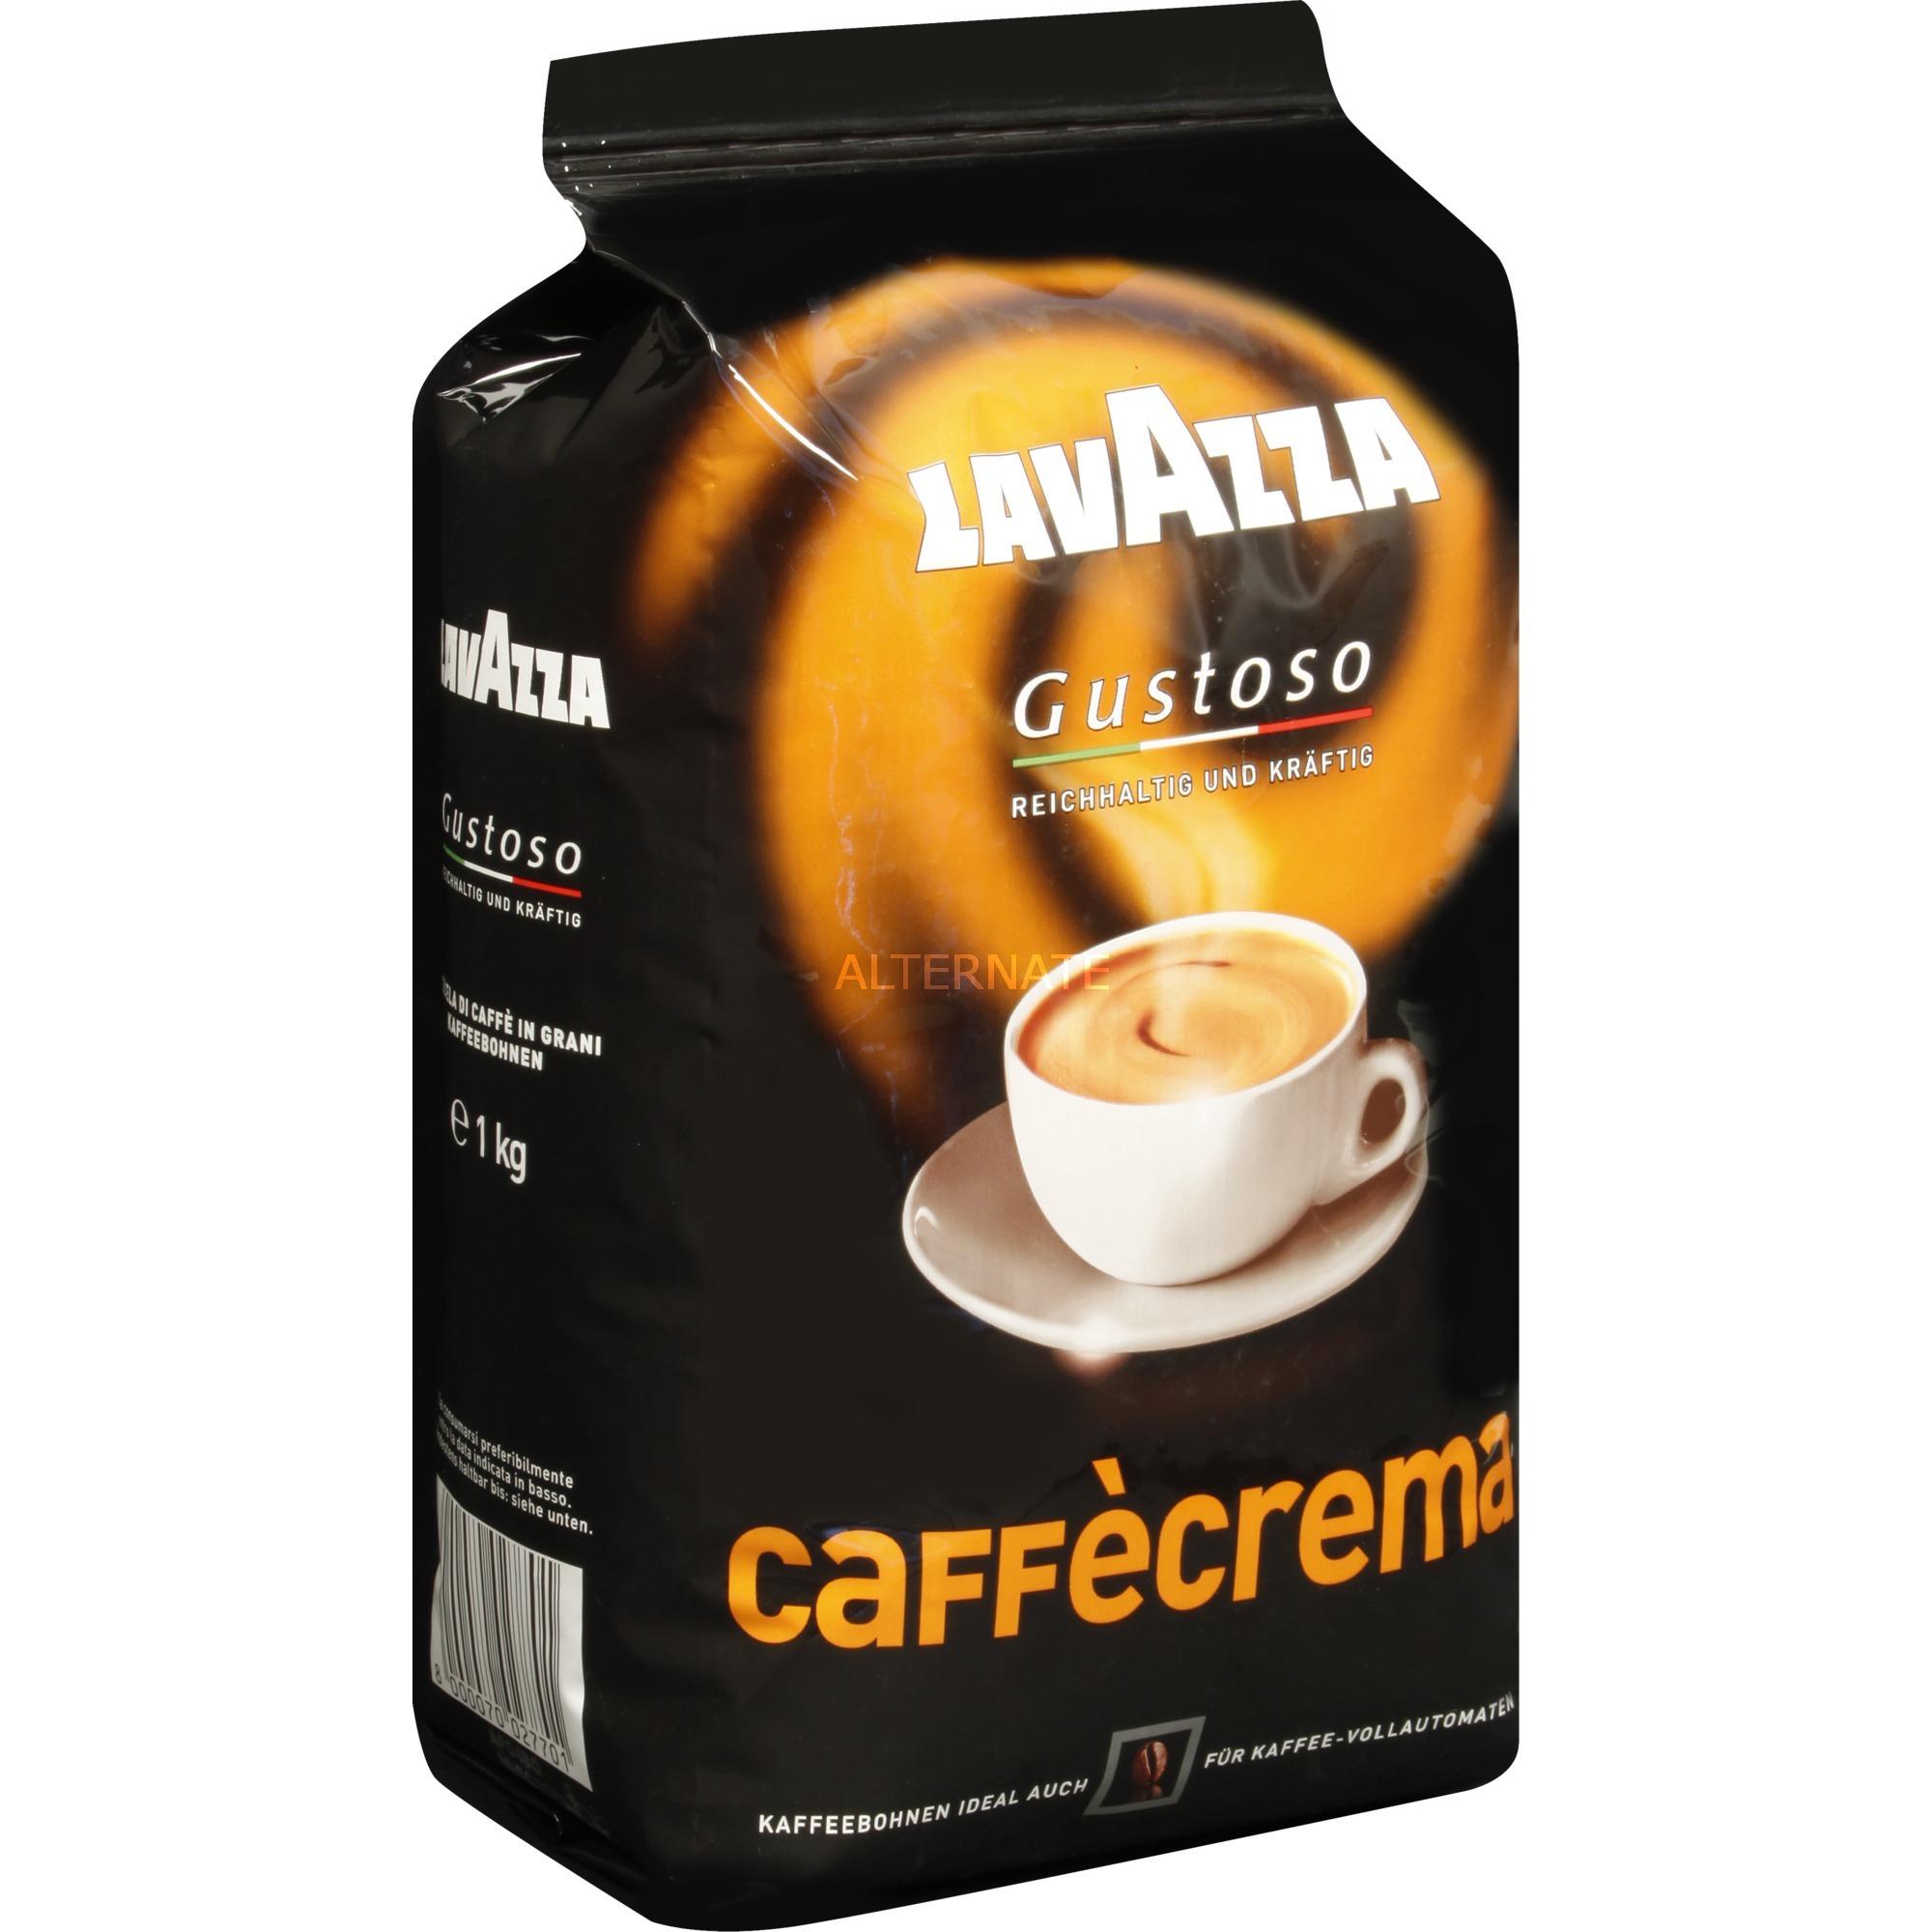 Caffè Crema Gustoso 1kg 1000g, Café